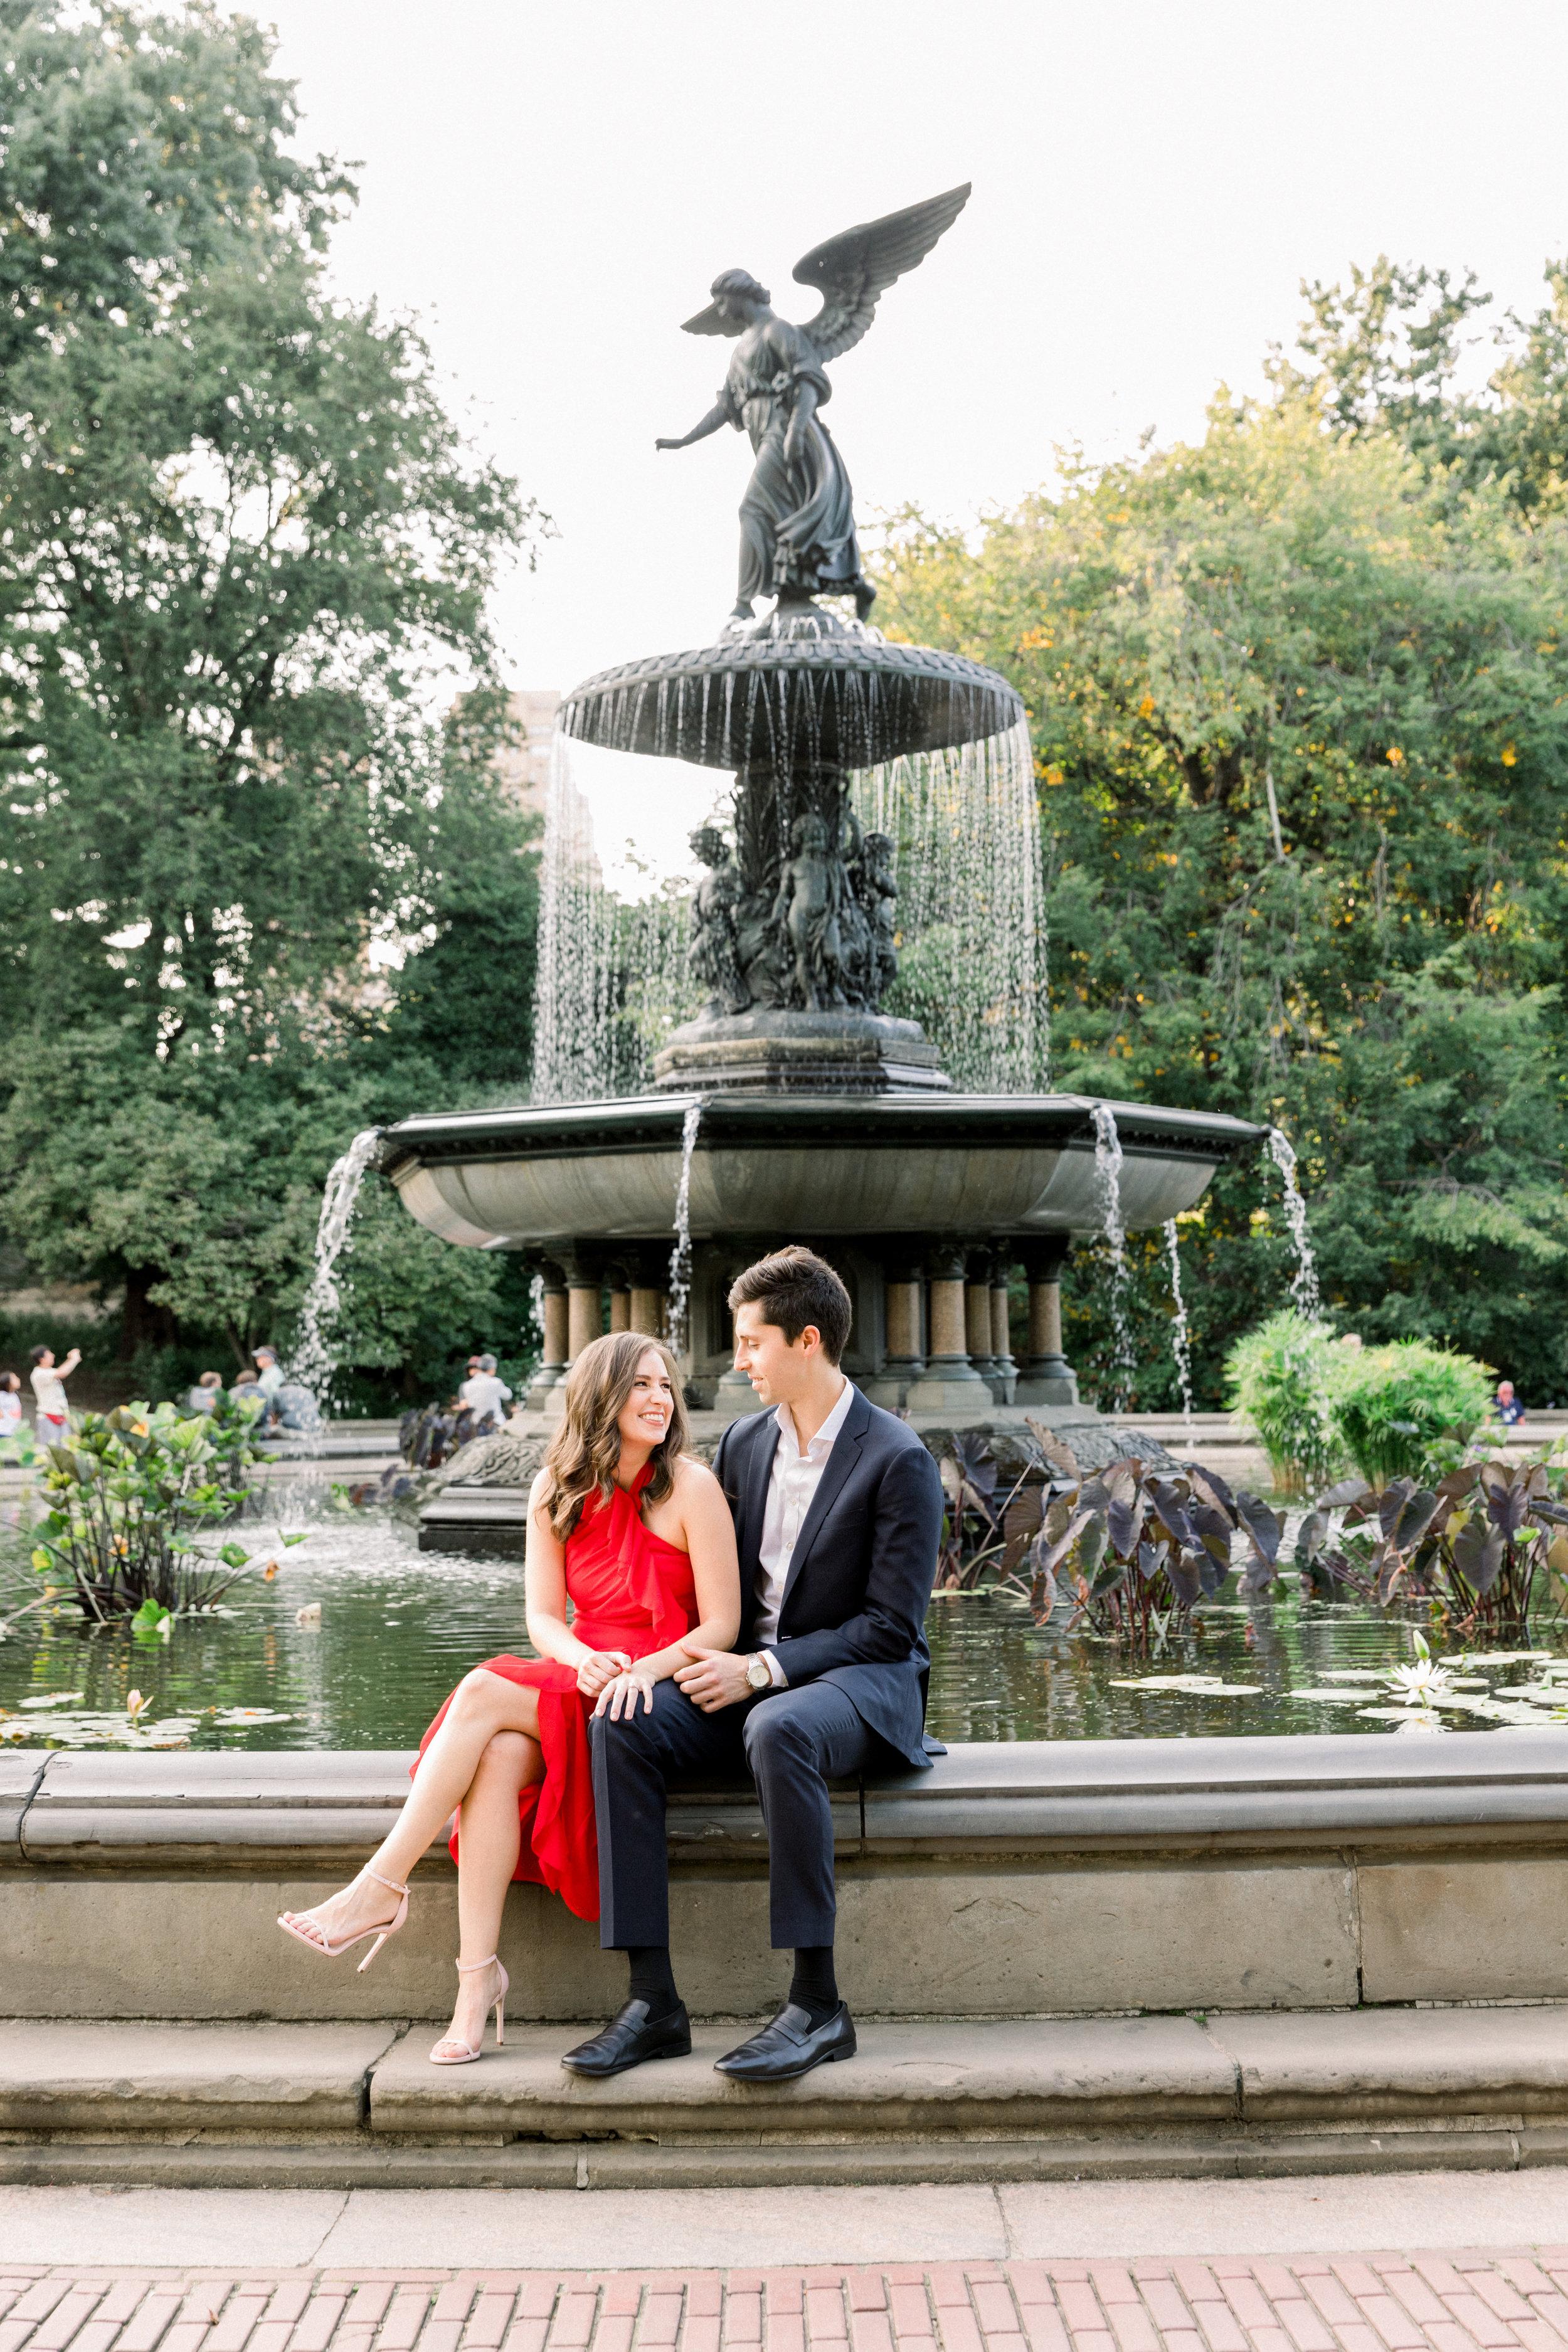 Hudson-Nichols-Central-Park-NYC-Fine-Art-Film-Engagement-Photography-01.jpg